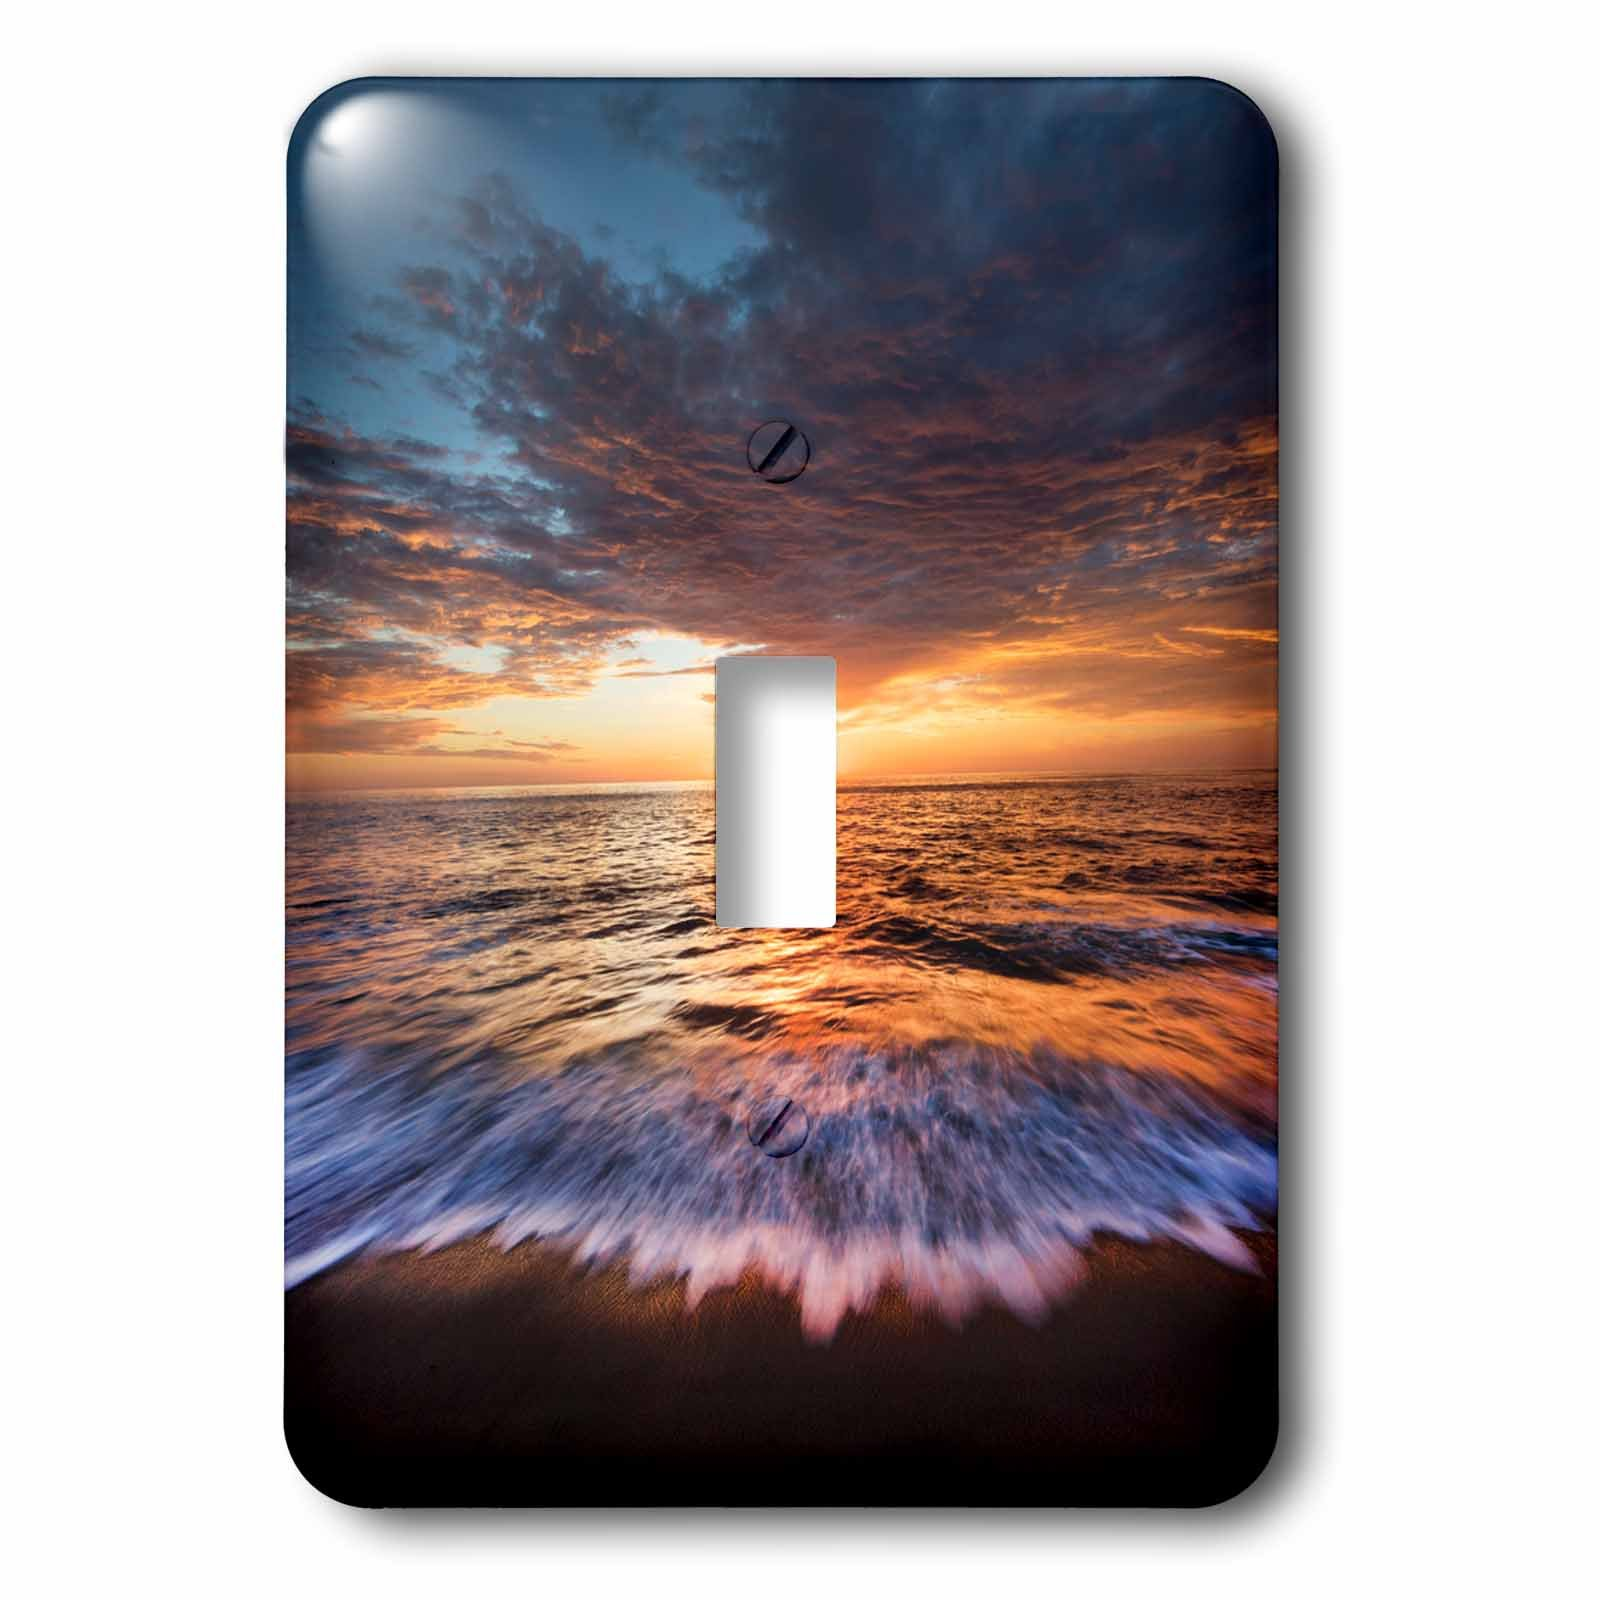 3dRose Danita Delimont - Beaches - USA, California, La Jolla. Dranatic sunset at the beach. - Light Switch Covers - single toggle switch (lsp_278574_1)